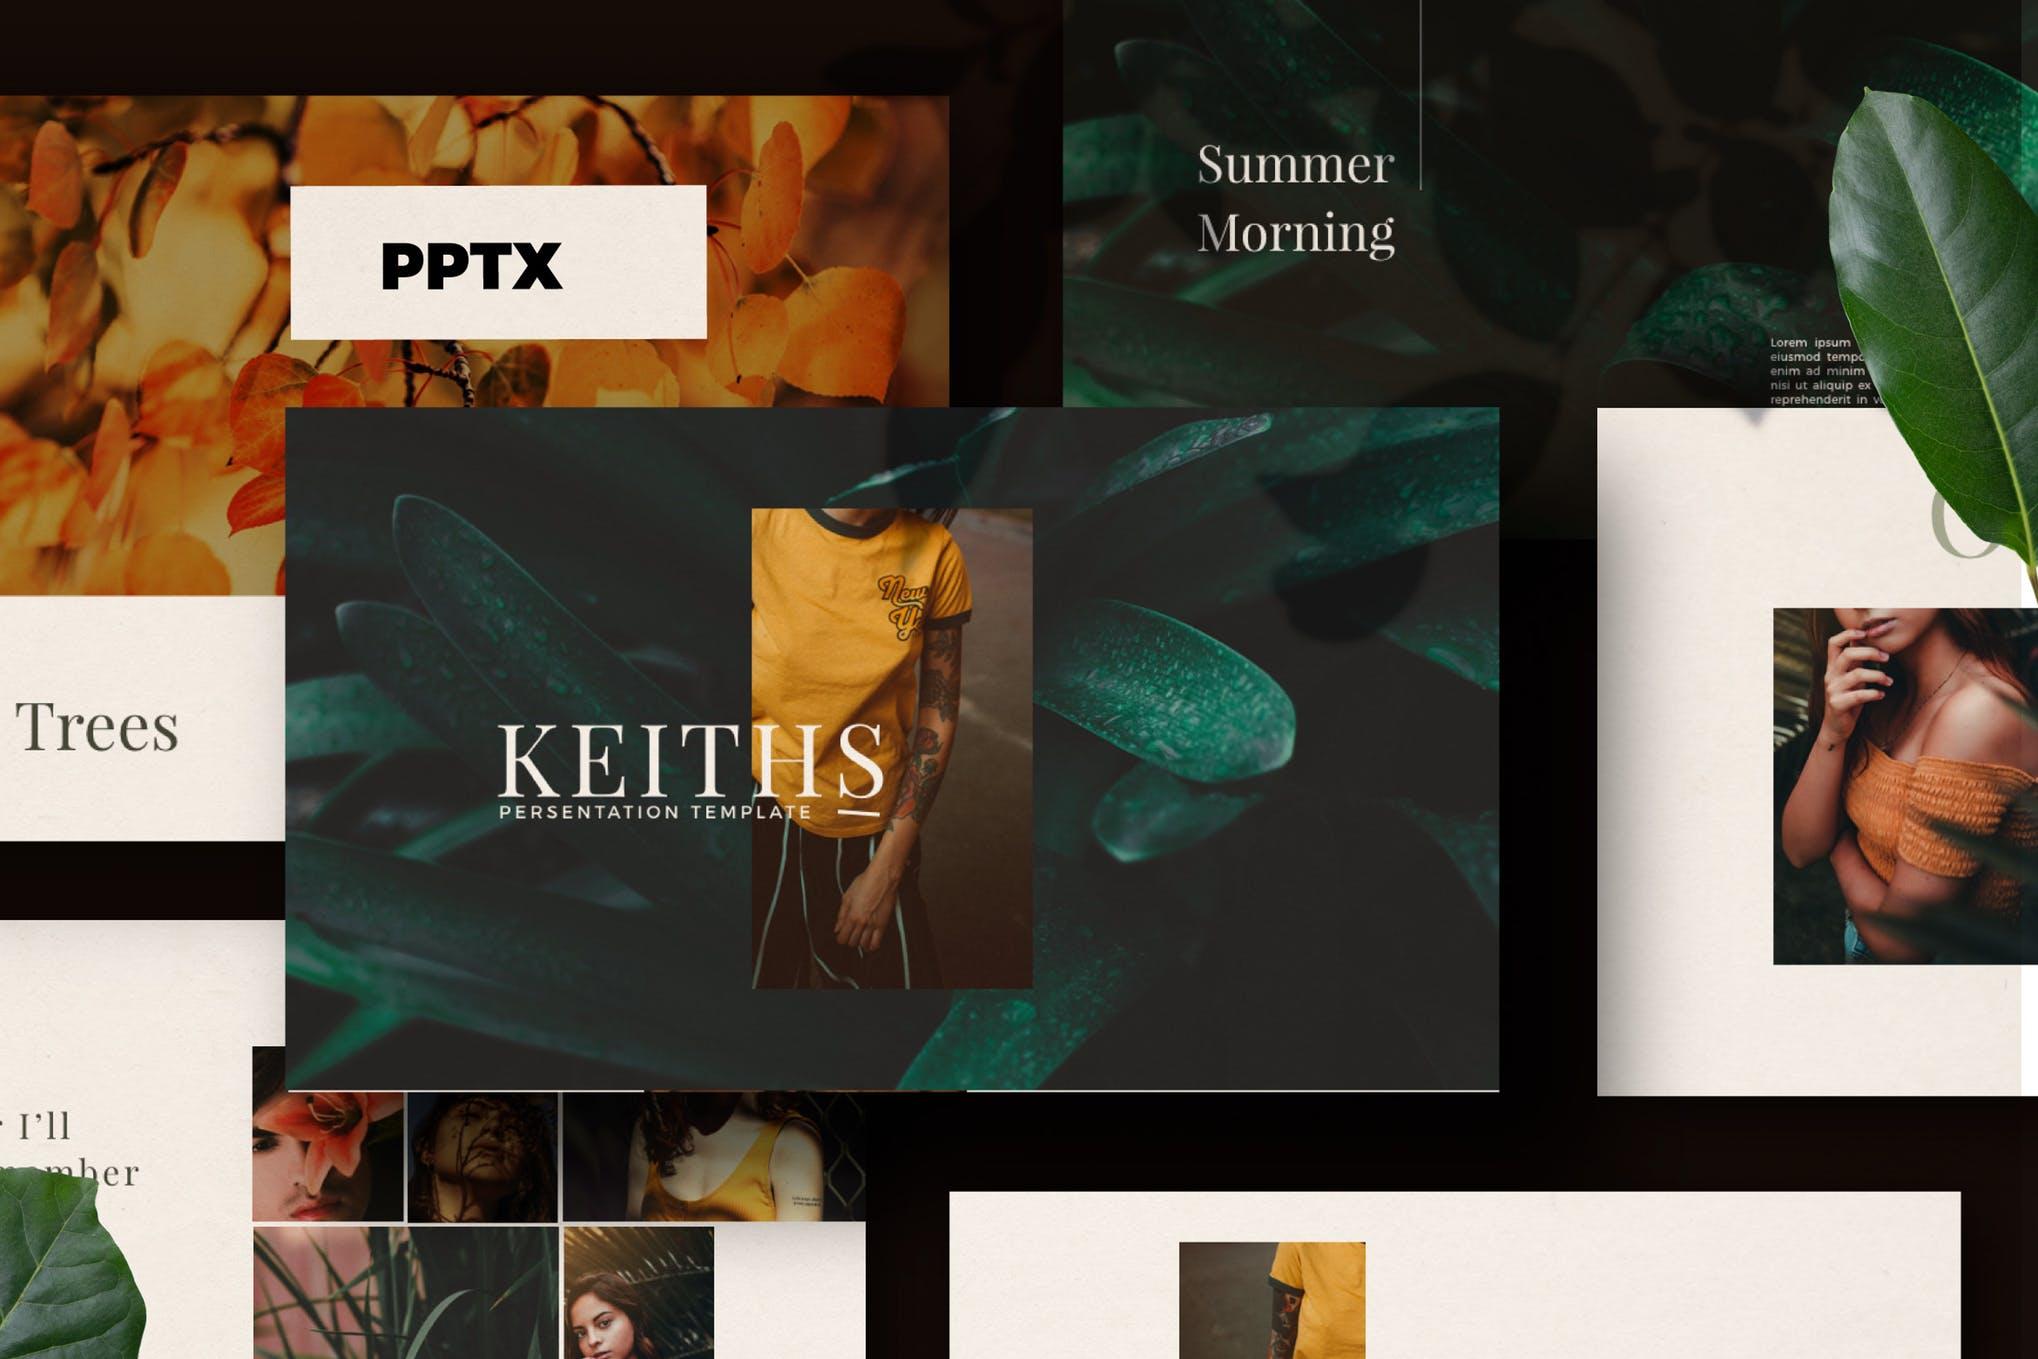 时尚简约女性服装营销设计师作品展示PPT模板KEY幻灯片SLIDES演示文稿 Keiths – Powerpoint, Keynote and Google Slides Templates插图